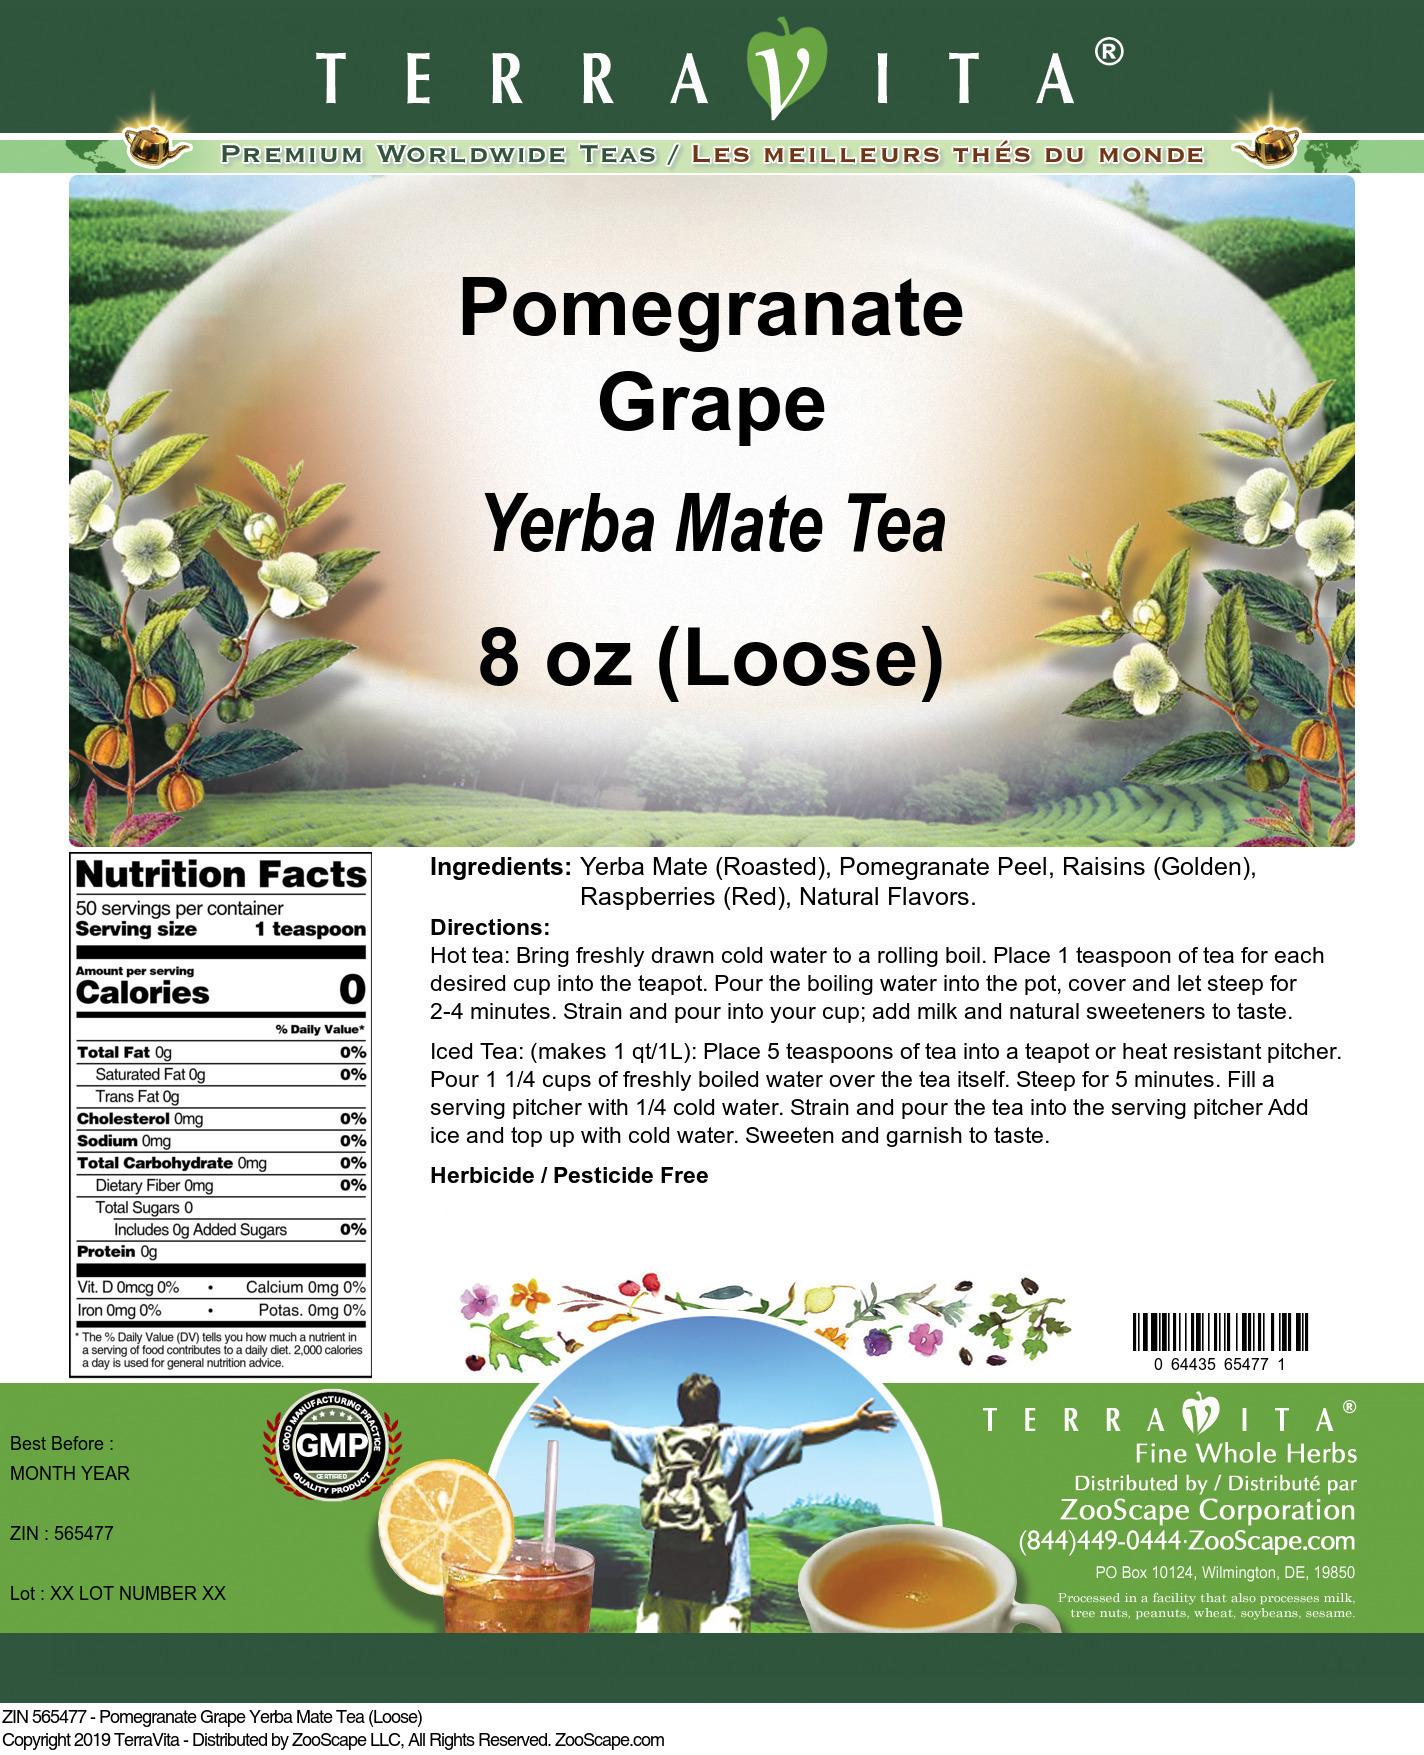 Pomegranate Grape Yerba Mate